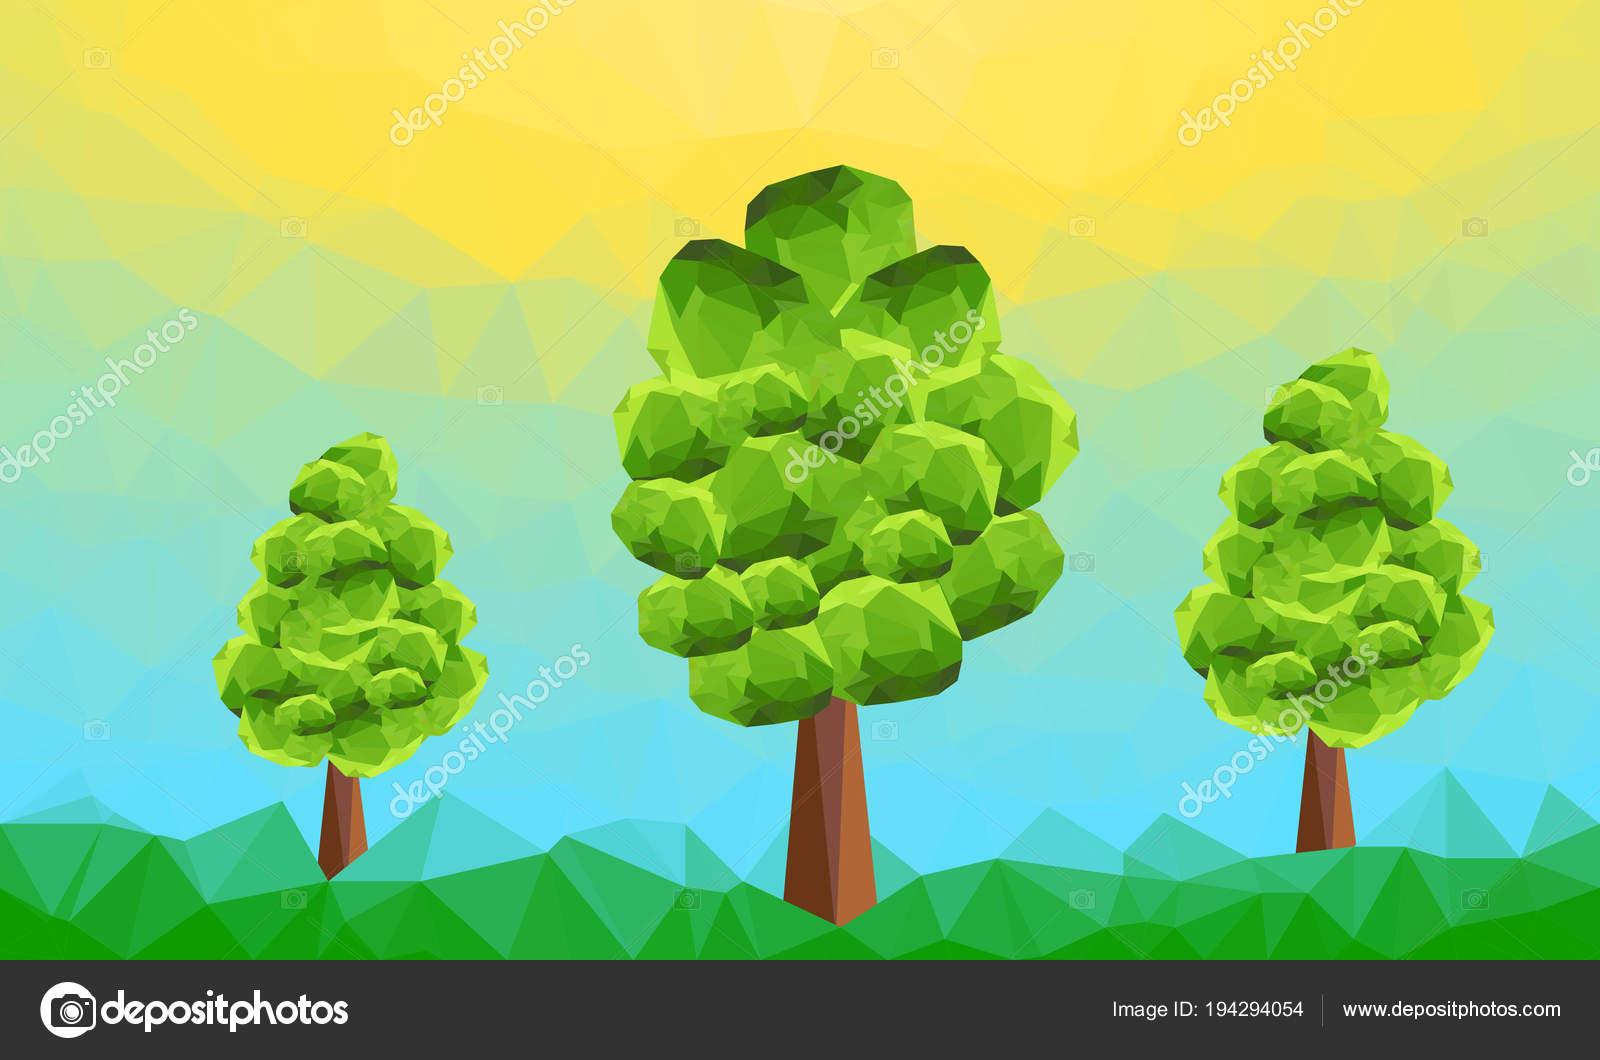 Resumen Poligonal Paisaje Verde Con Árboles Montaña Fondo Gráfico ...